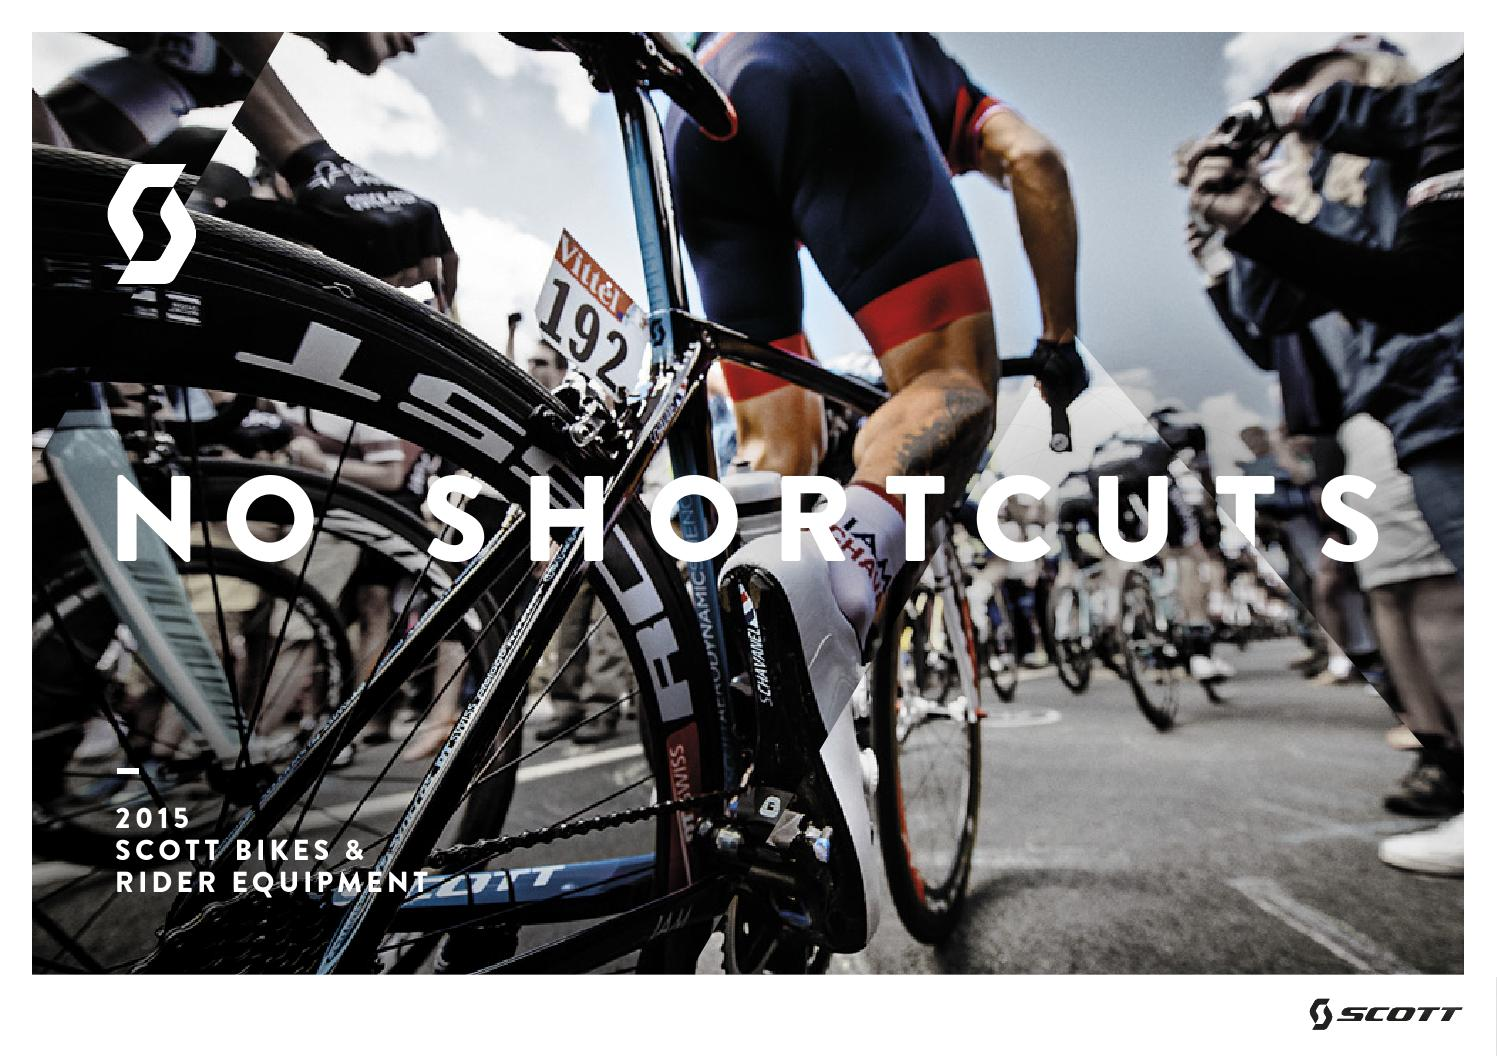 consumer catalog 2015 bike scott sports en issuu by scott. Black Bedroom Furniture Sets. Home Design Ideas